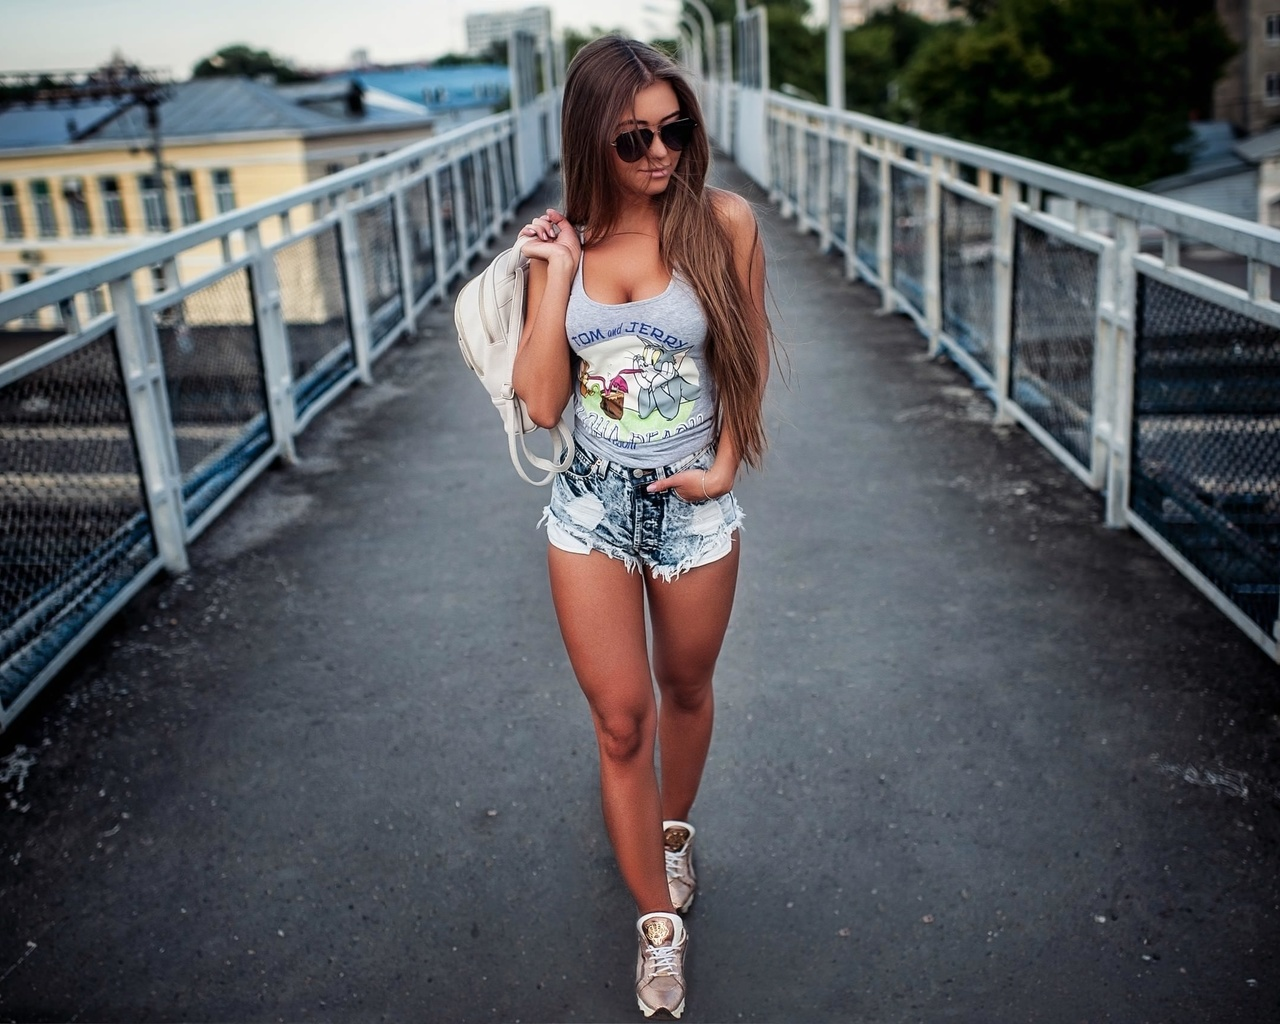 women, tank top, jean shorts, tanned, women outdoors, sunglasses, bridge, handbags, sneakers, long hair, railway, brunette